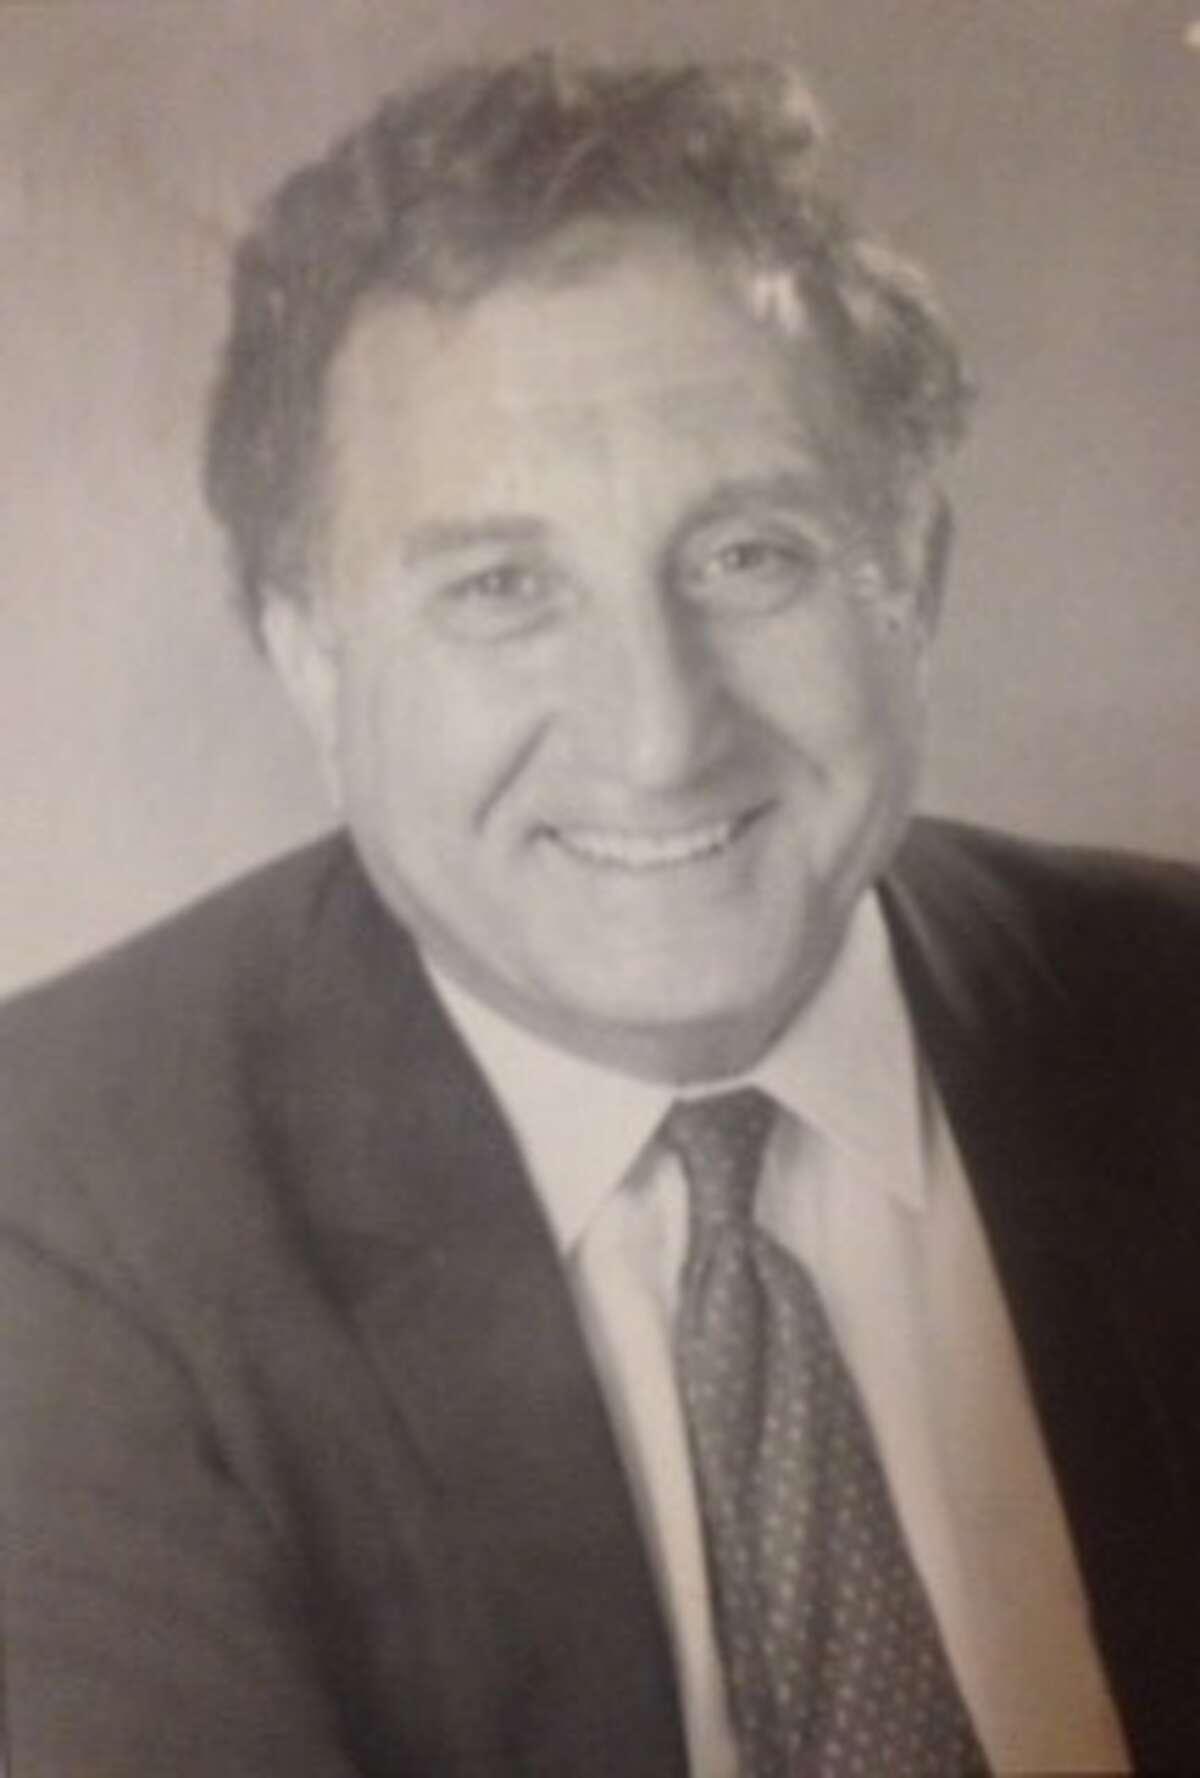 Frank Barbaro